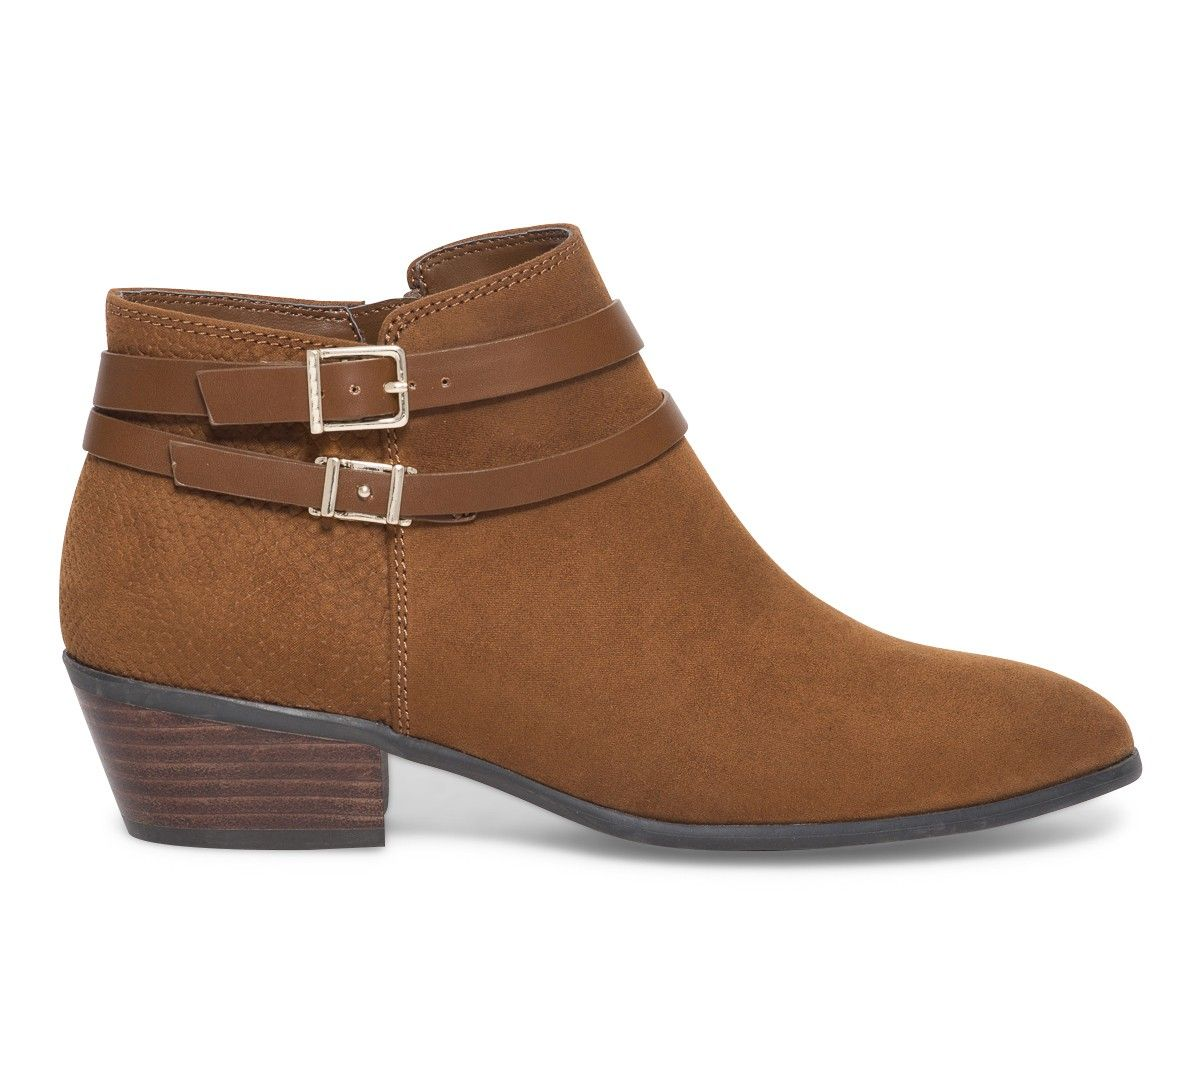 7a7bdb56f6a Boots brides camel - Boots   bottines - Chaussures femme